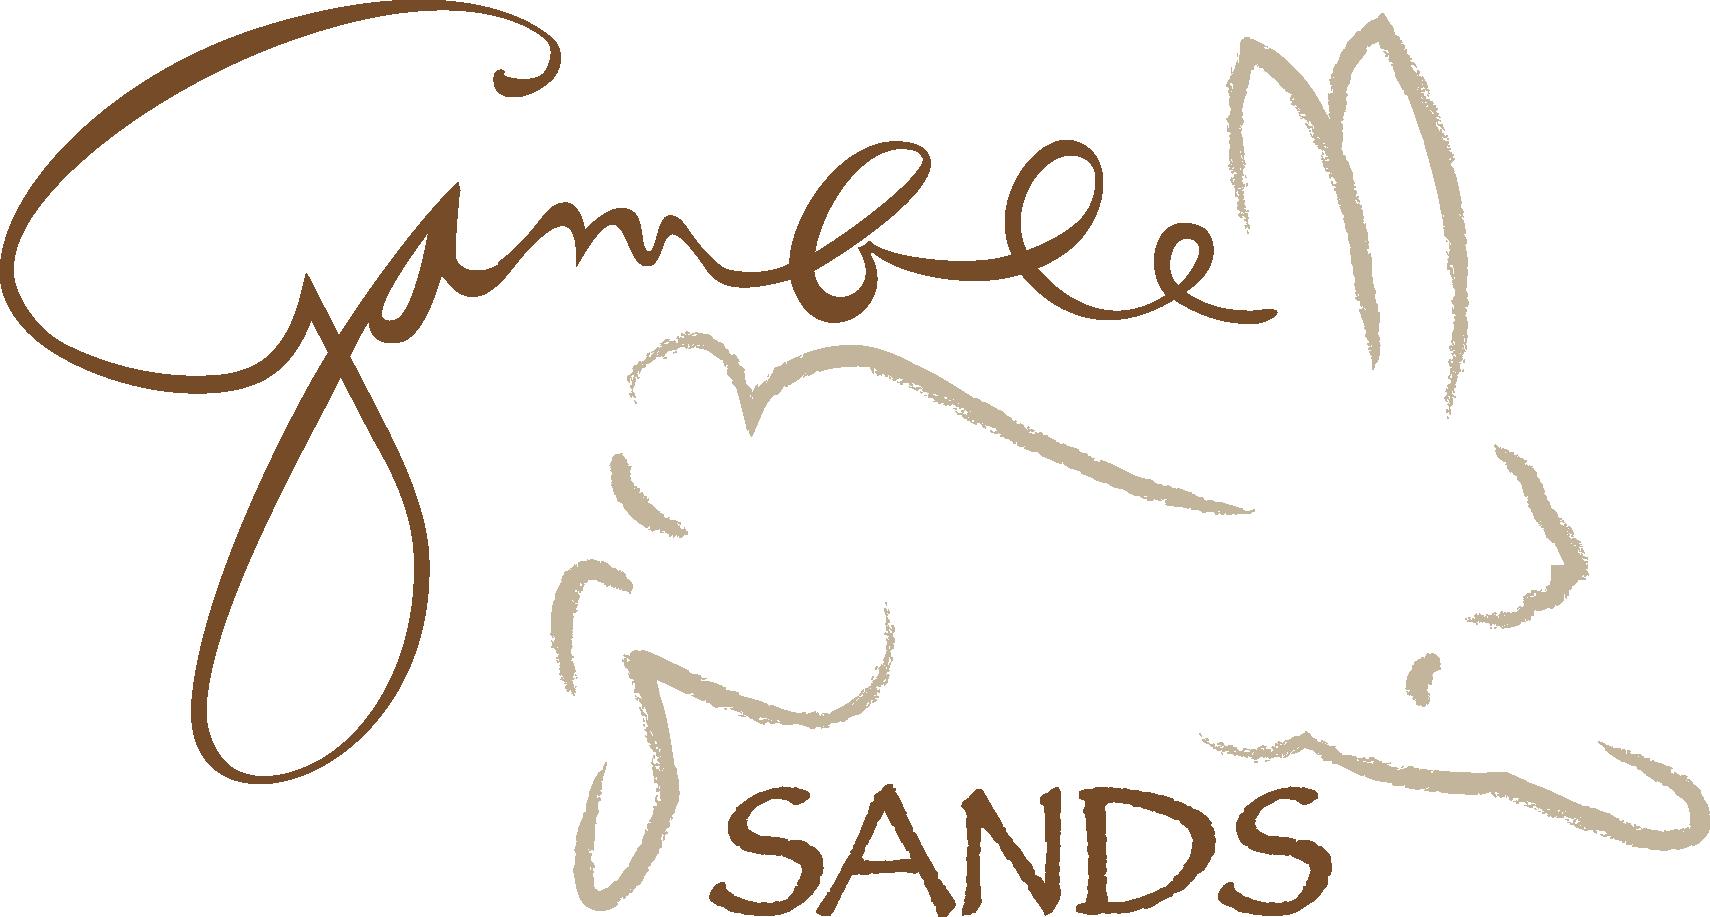 Gamble Sands Dedicated Email '19's Logo